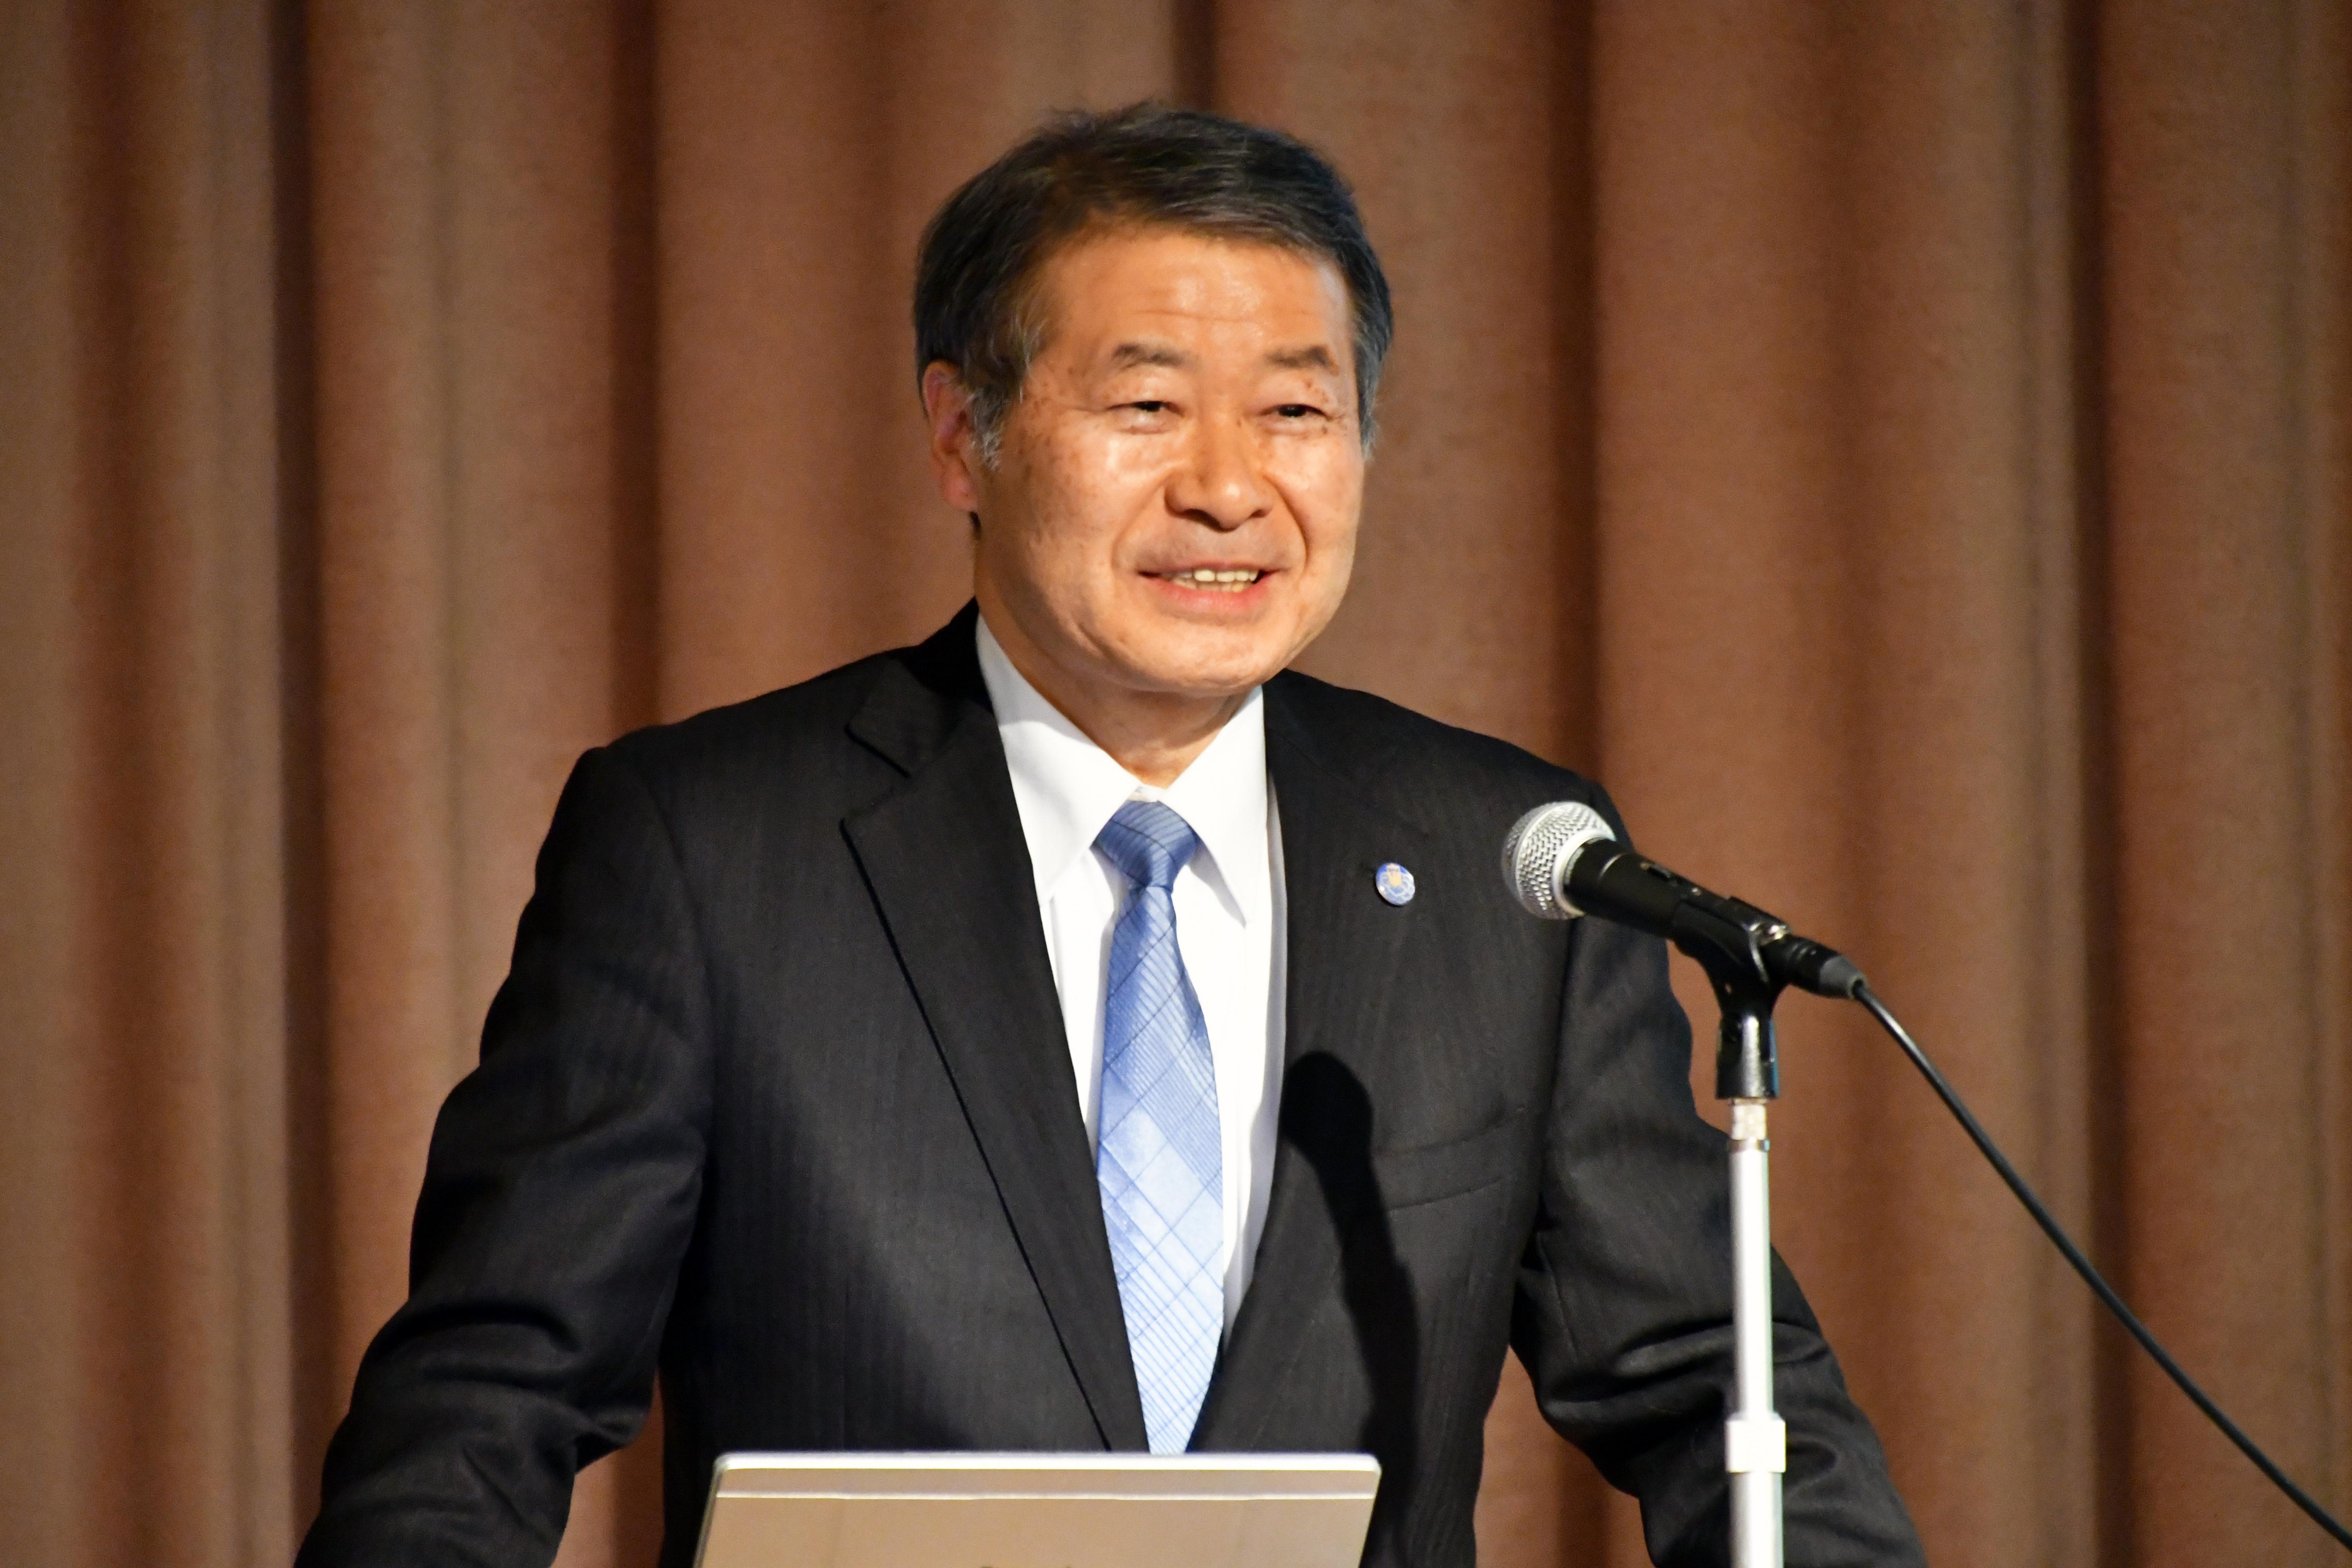 事業説明する吉澤 篤弘前大学COC推進室長